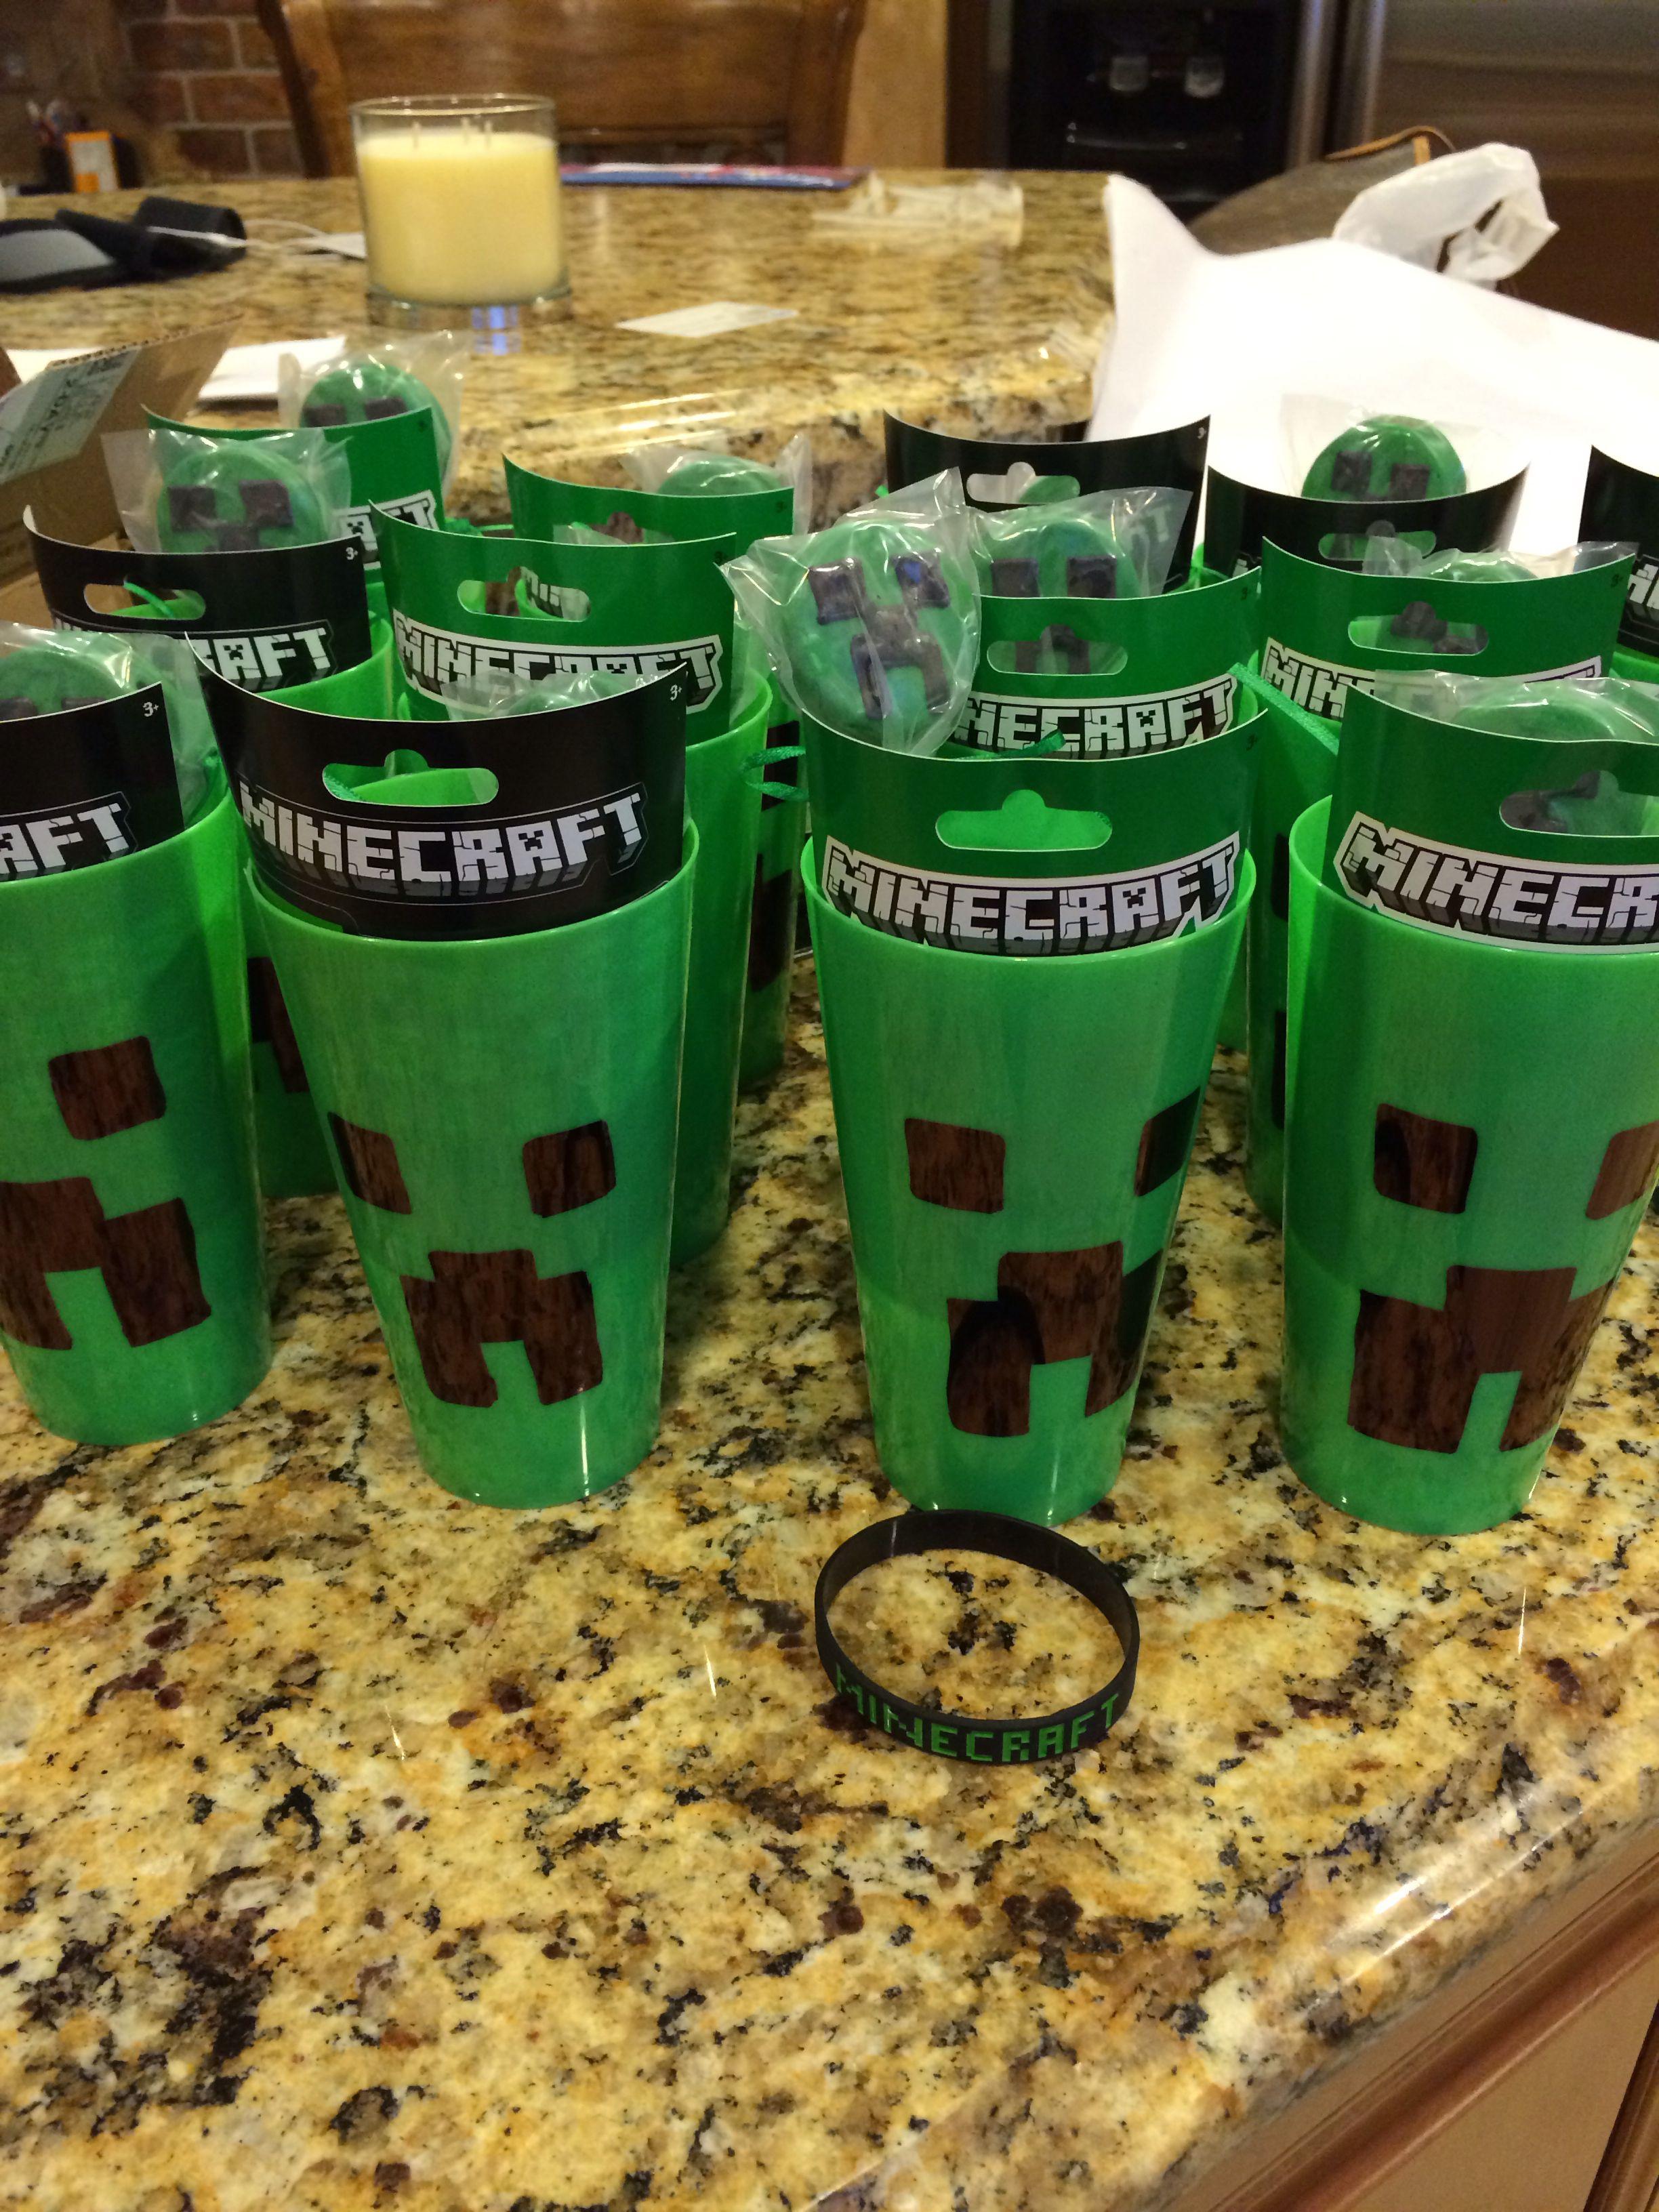 Pin By Layne Nascimento On Minecraft Party Minecraft Party Favors Minecraft Birthday Party Games Minecraft Party